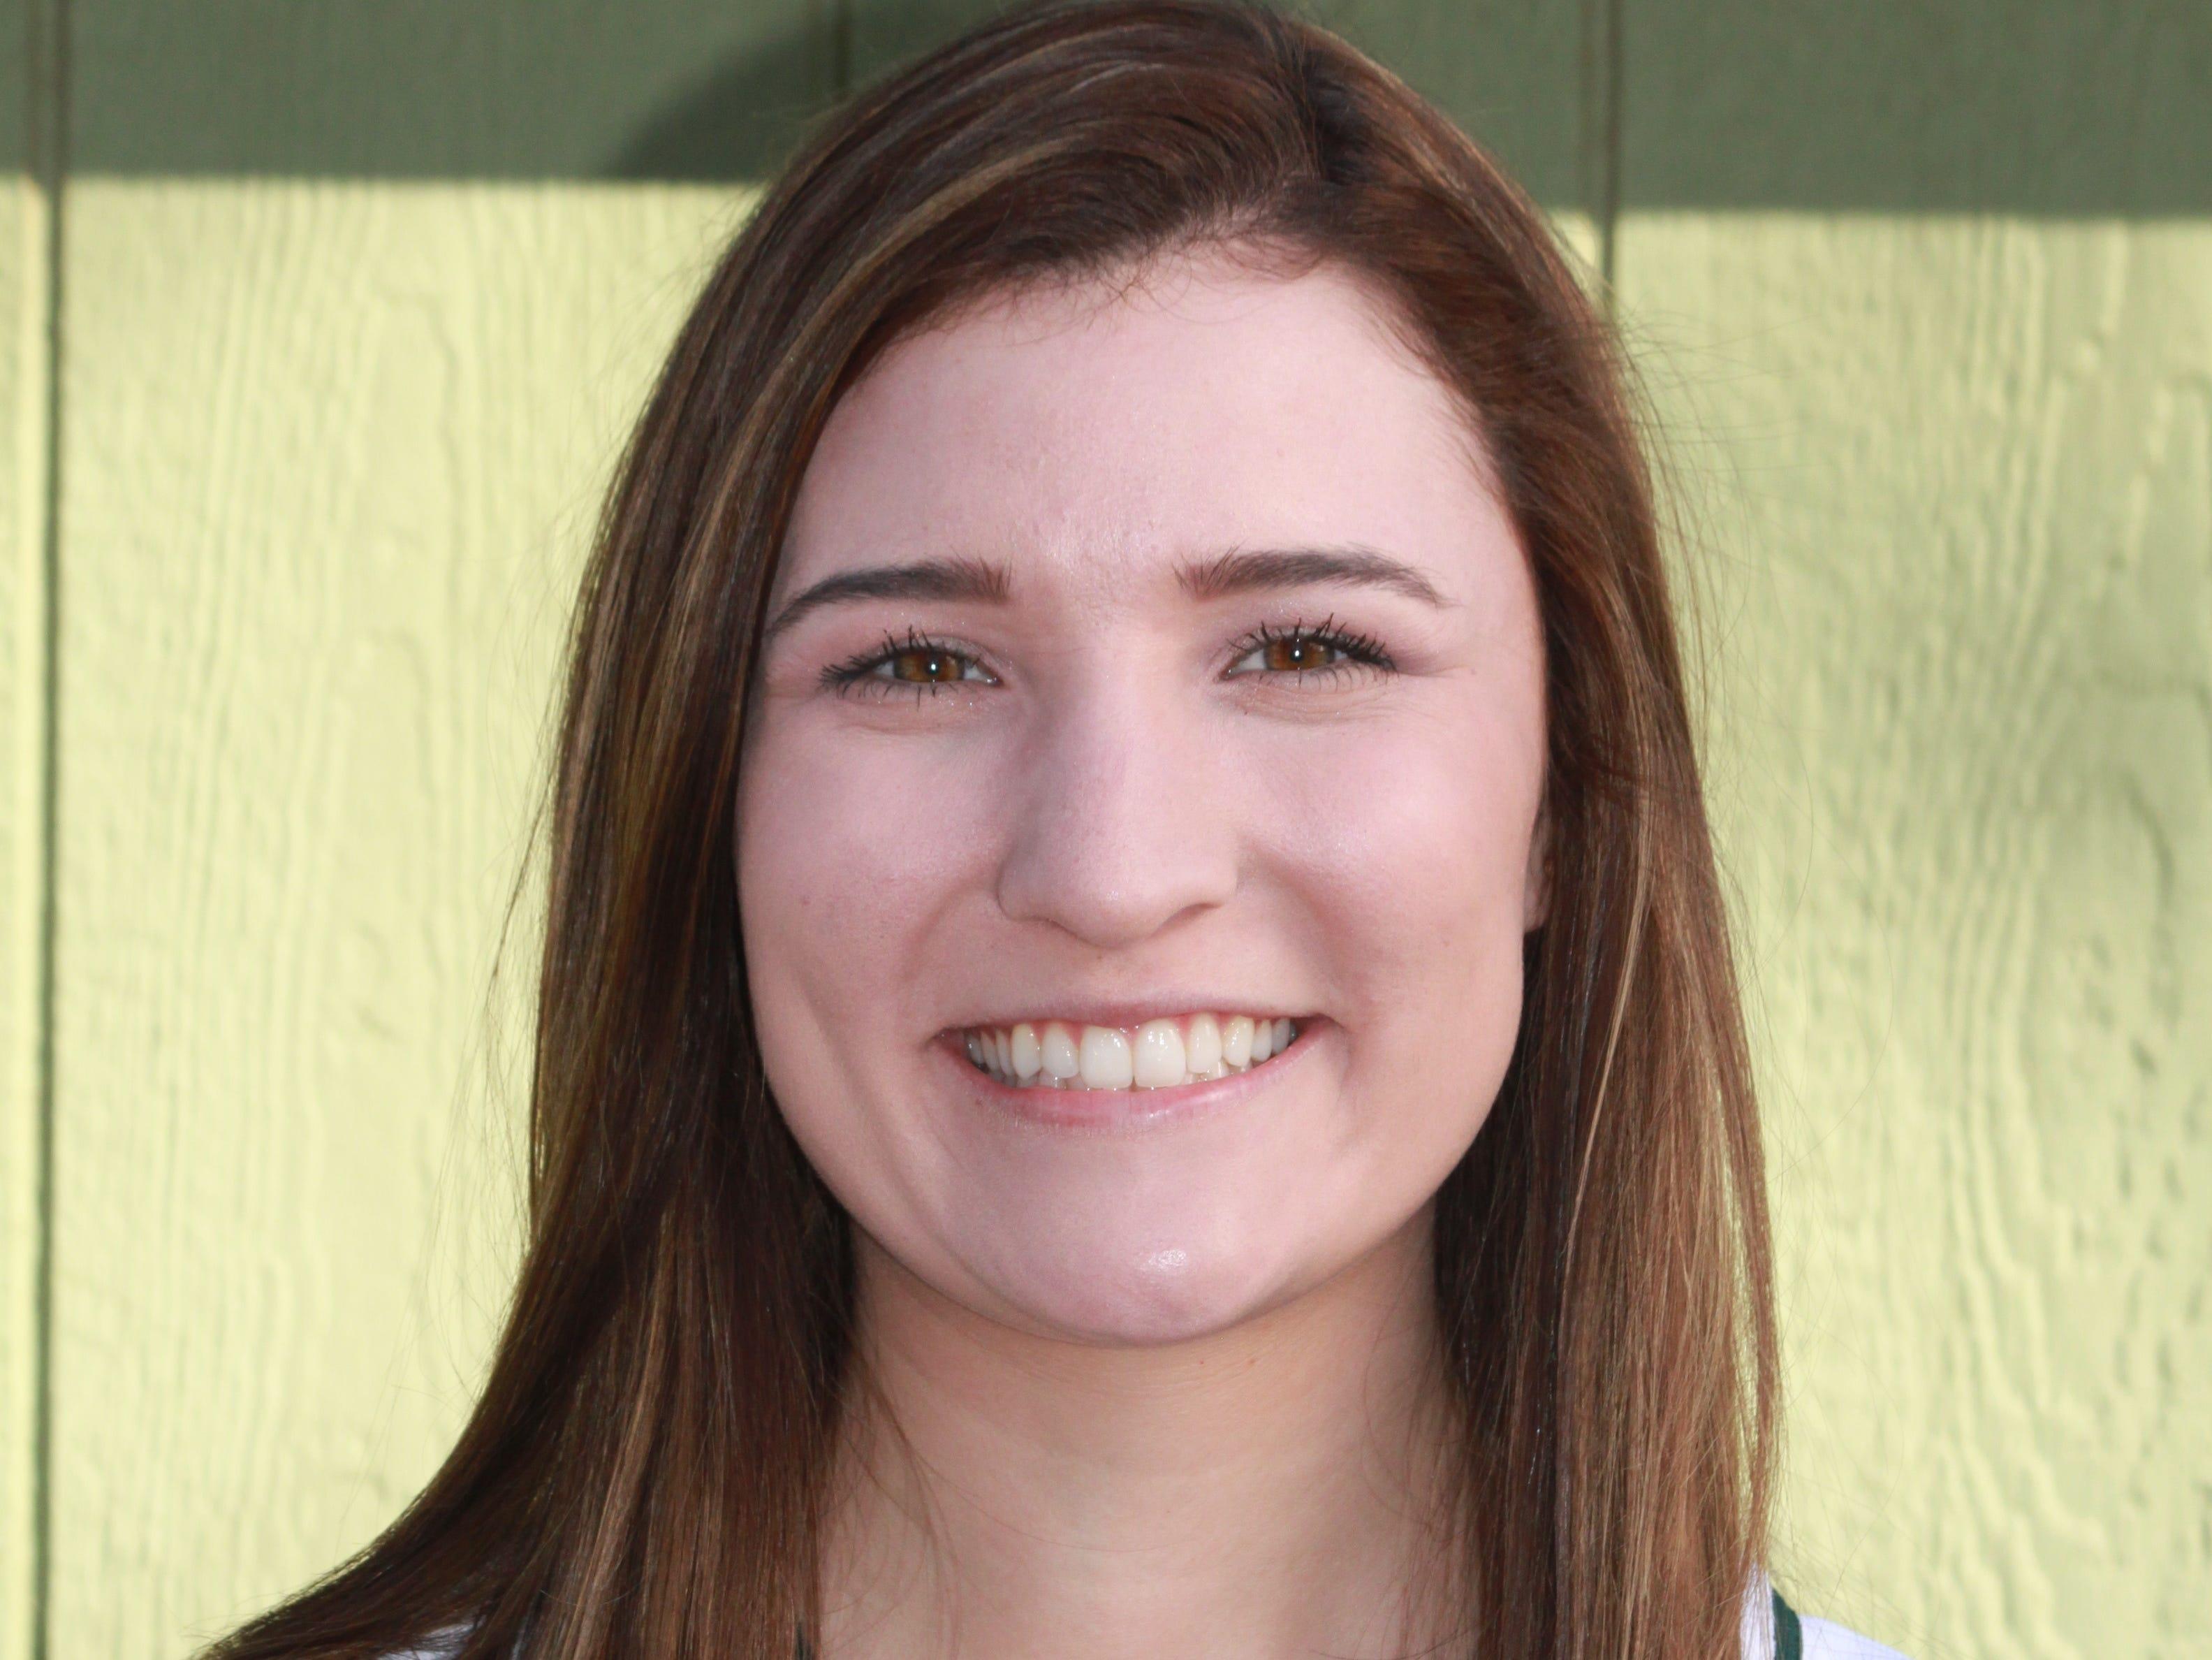 Photo of Shasta College softball player Marissa Hopkins